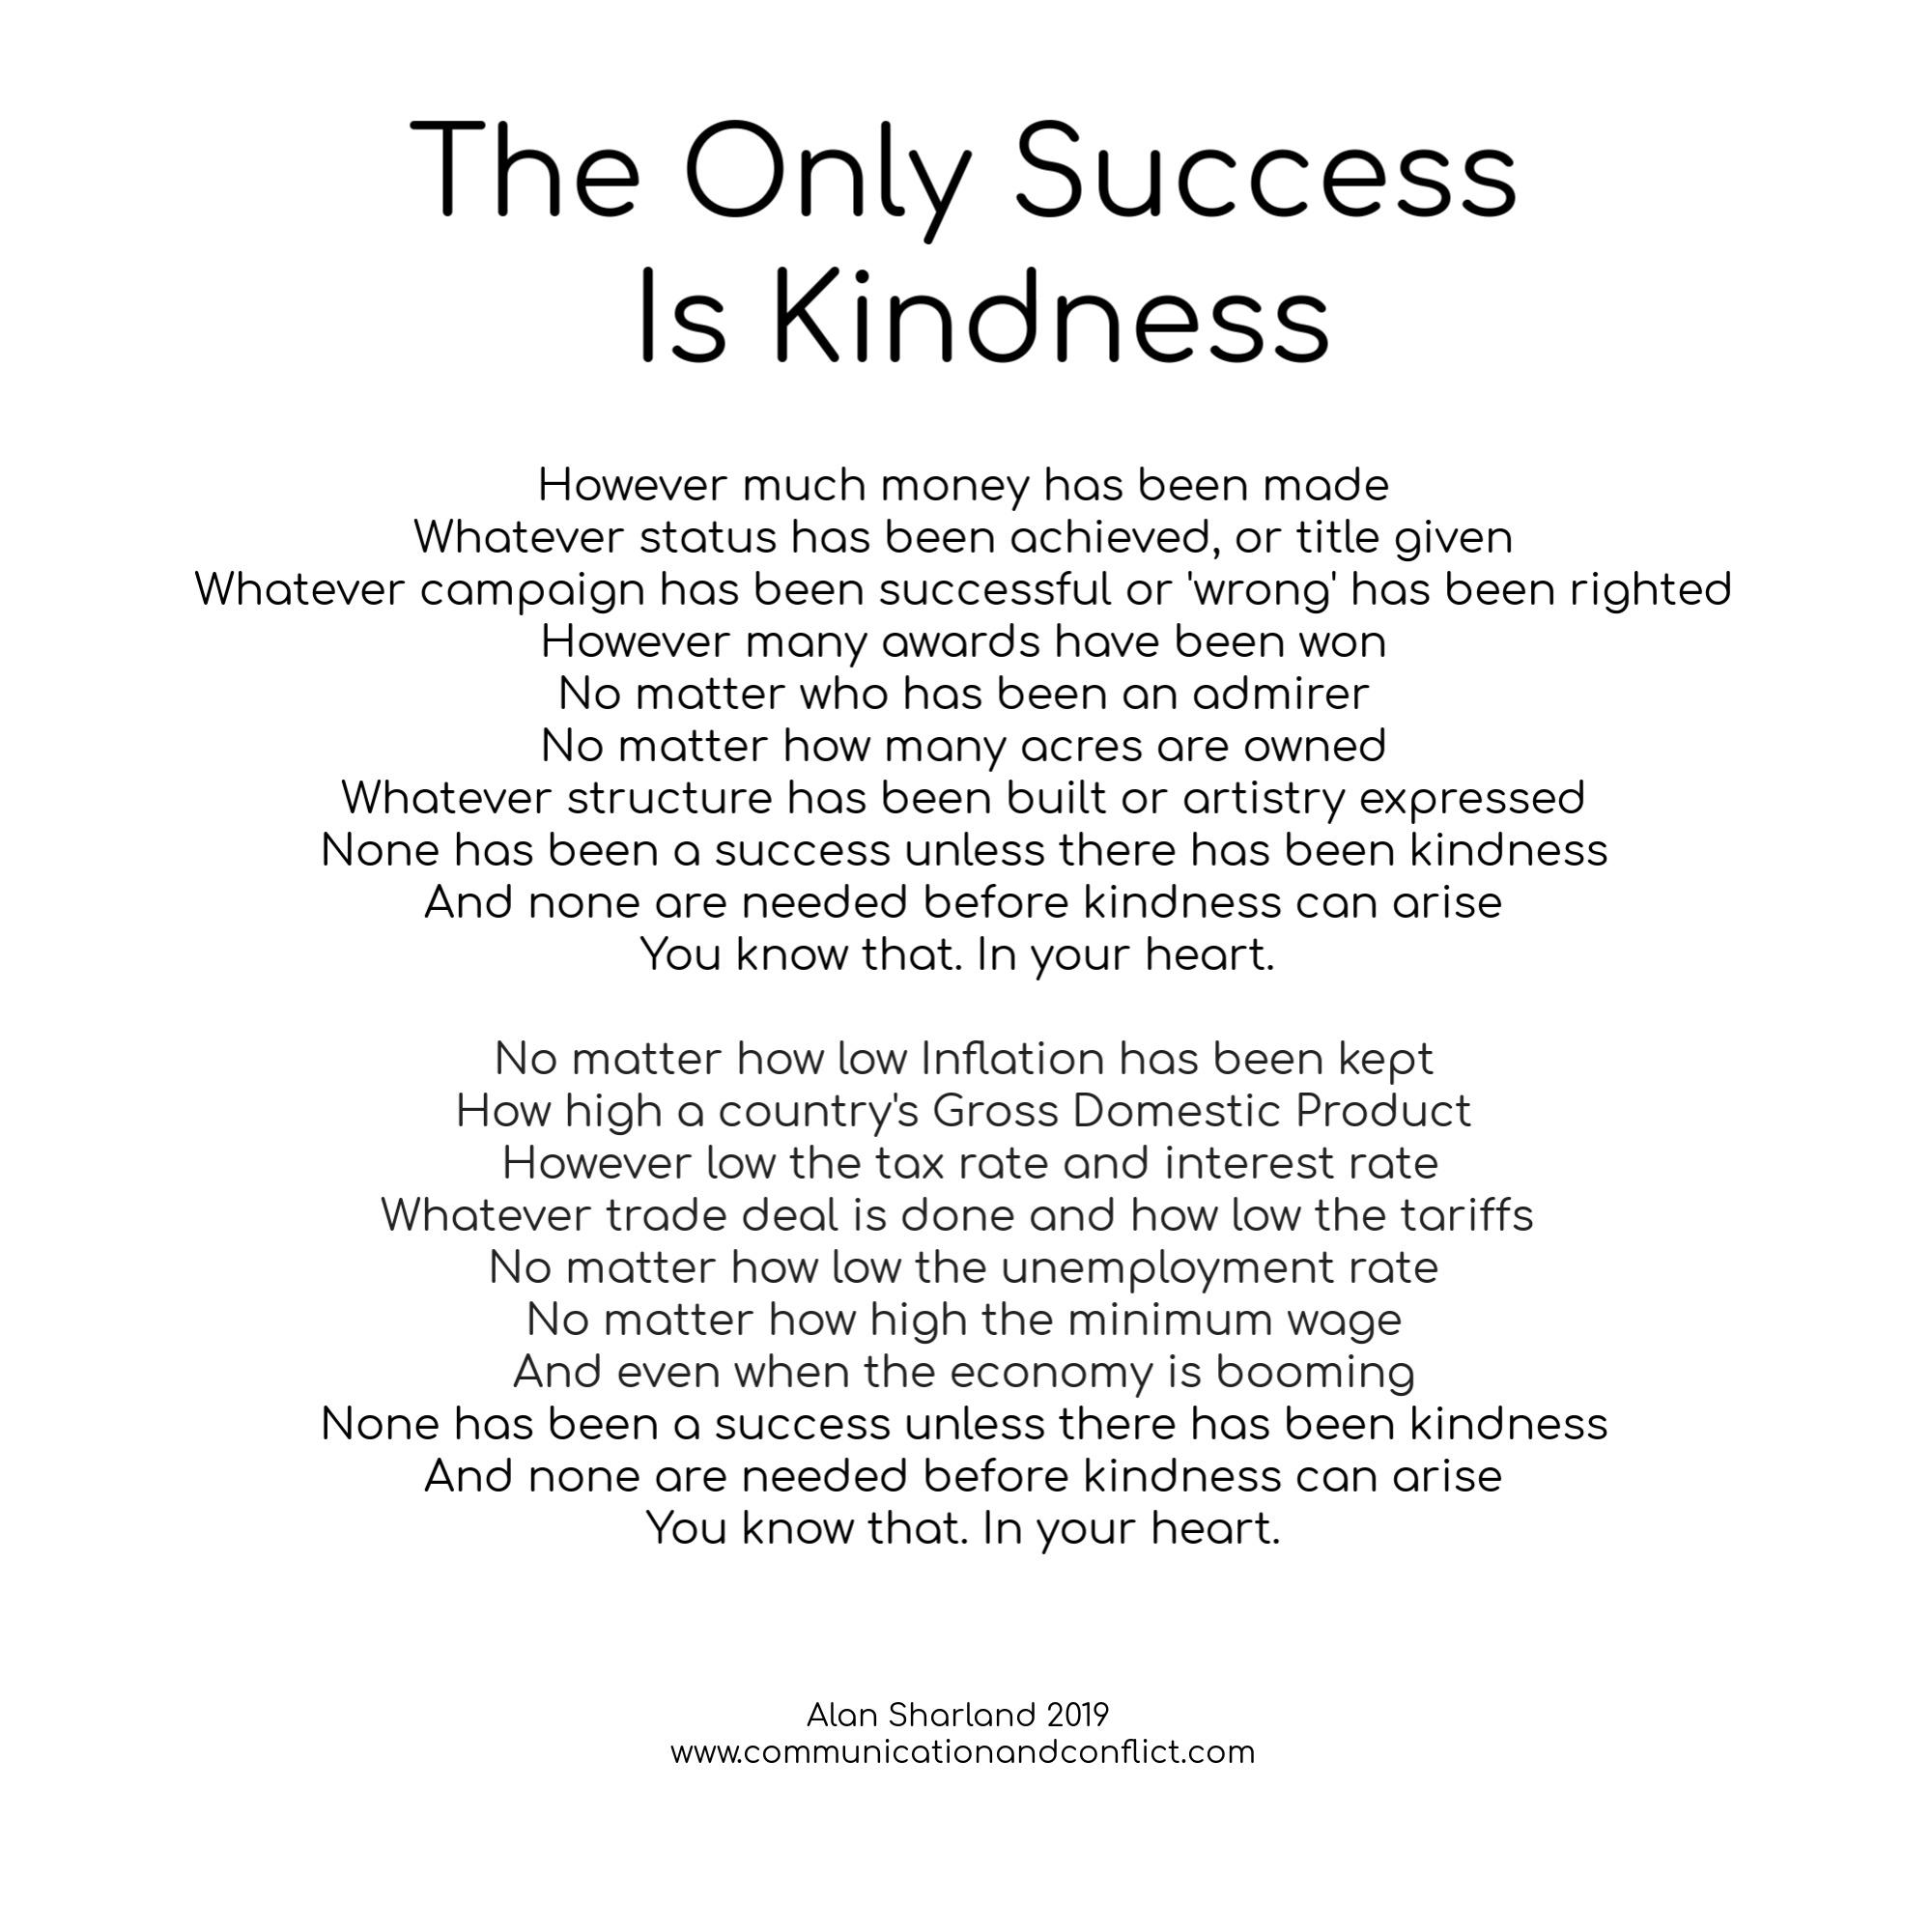 Kindness - communicationandconflict.com